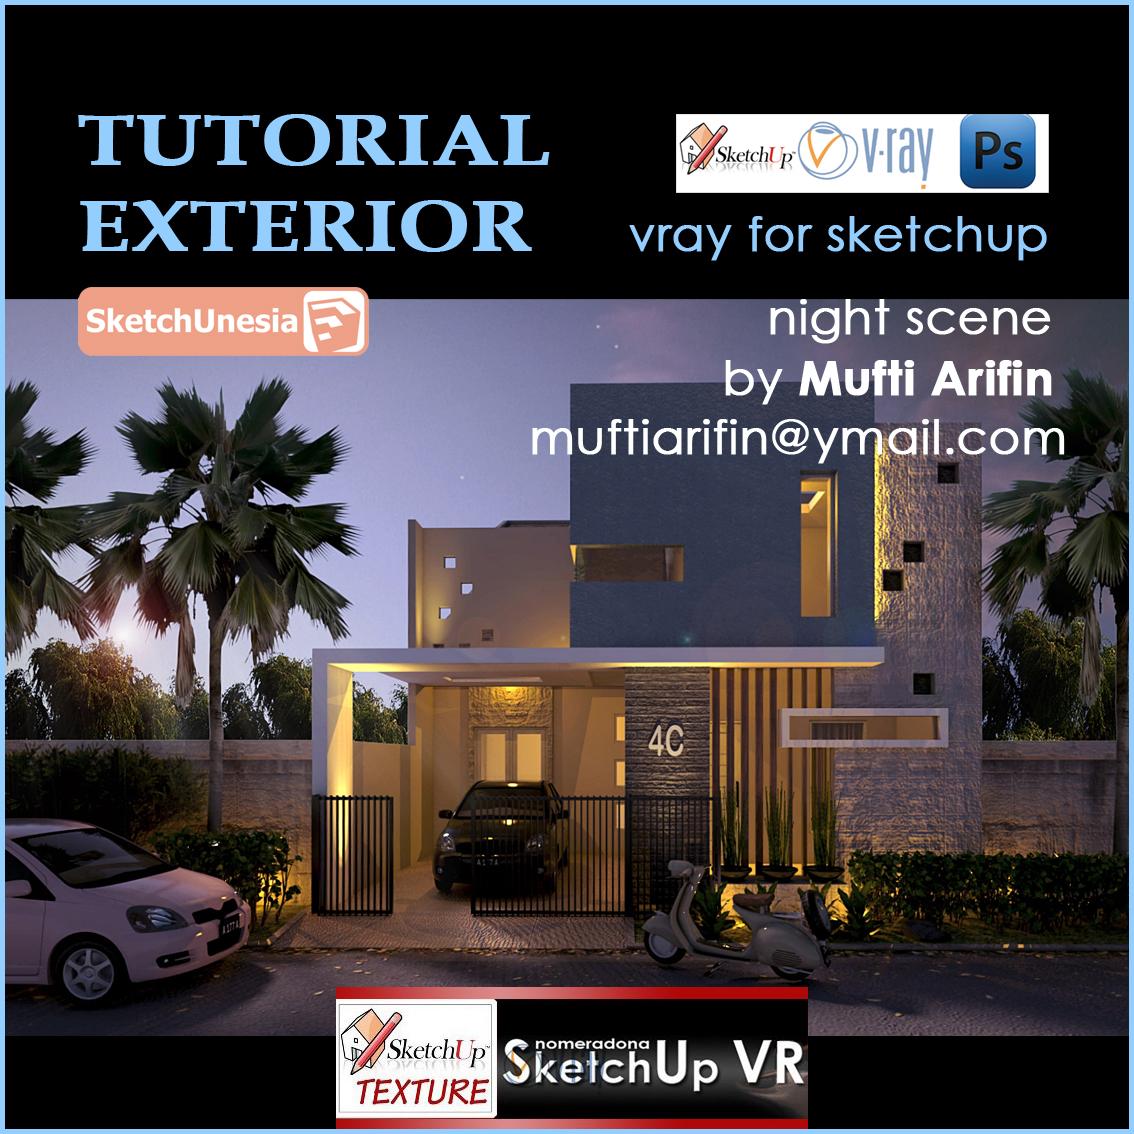 sketchup texture vray tutorial exterior rh sketchuptexture com manual sketchup 2014 español pdf sketchup pro 2014 manual pdf